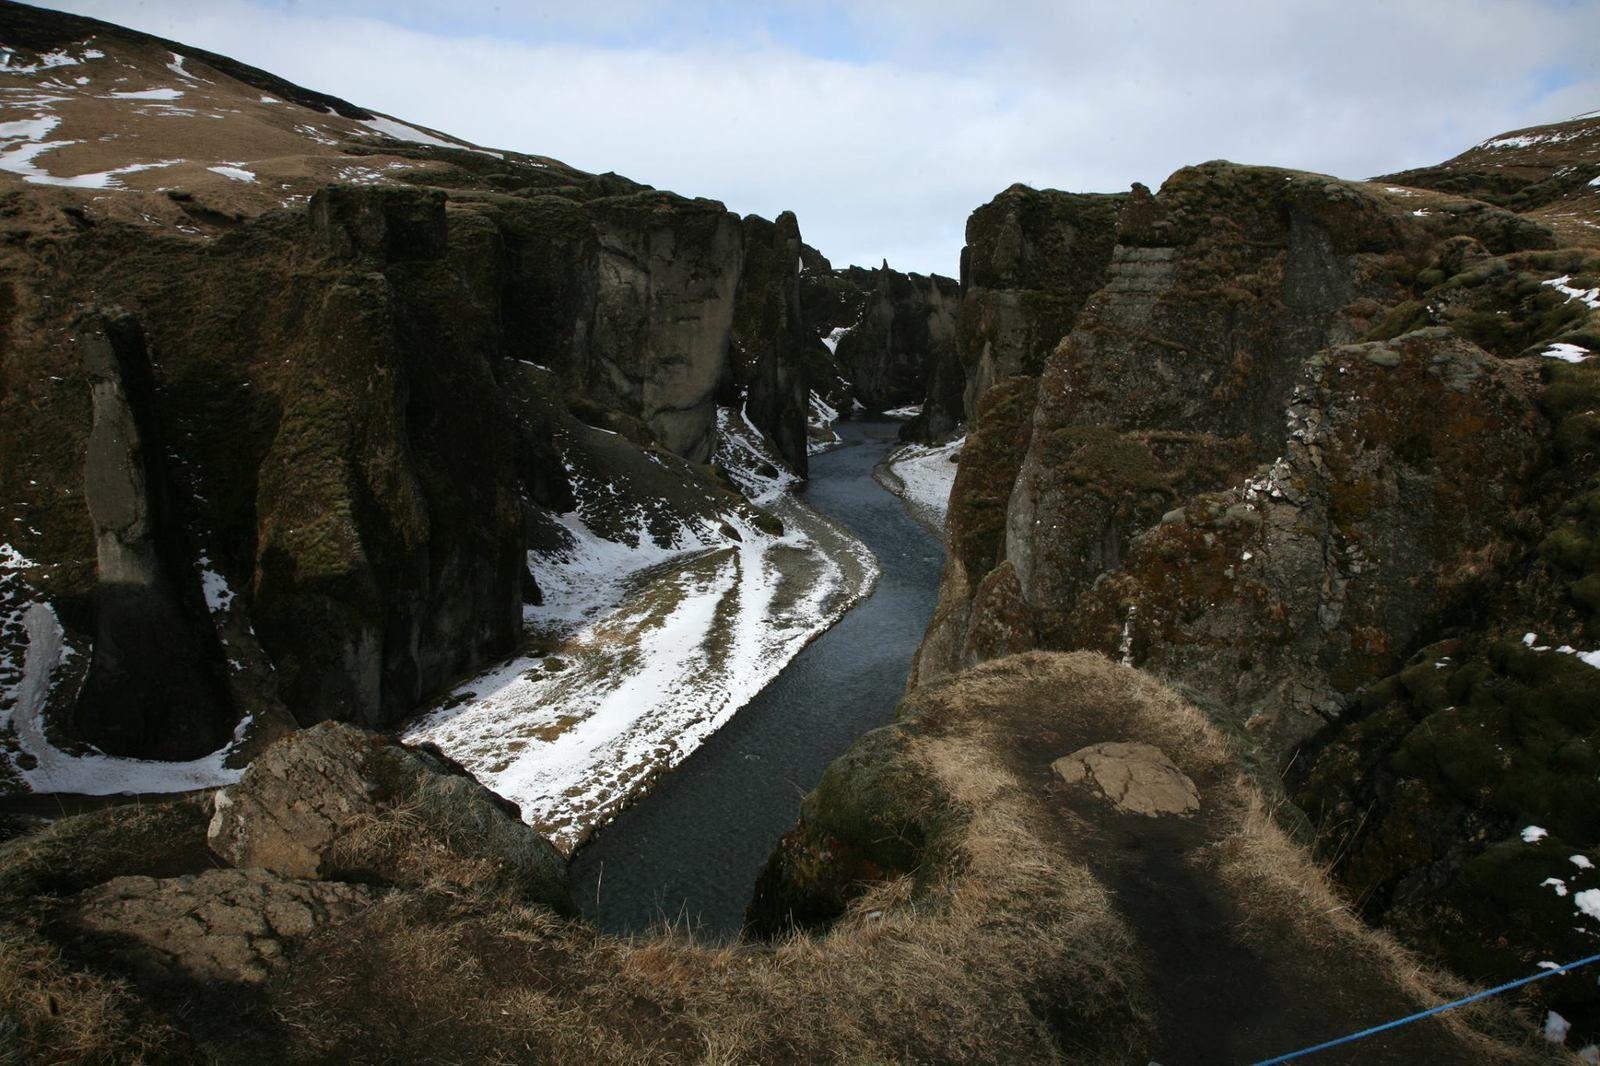 Fjaðrárgljúfur : un canyon creusé dans la palagonite. - photo © Bernard Duyck 2015